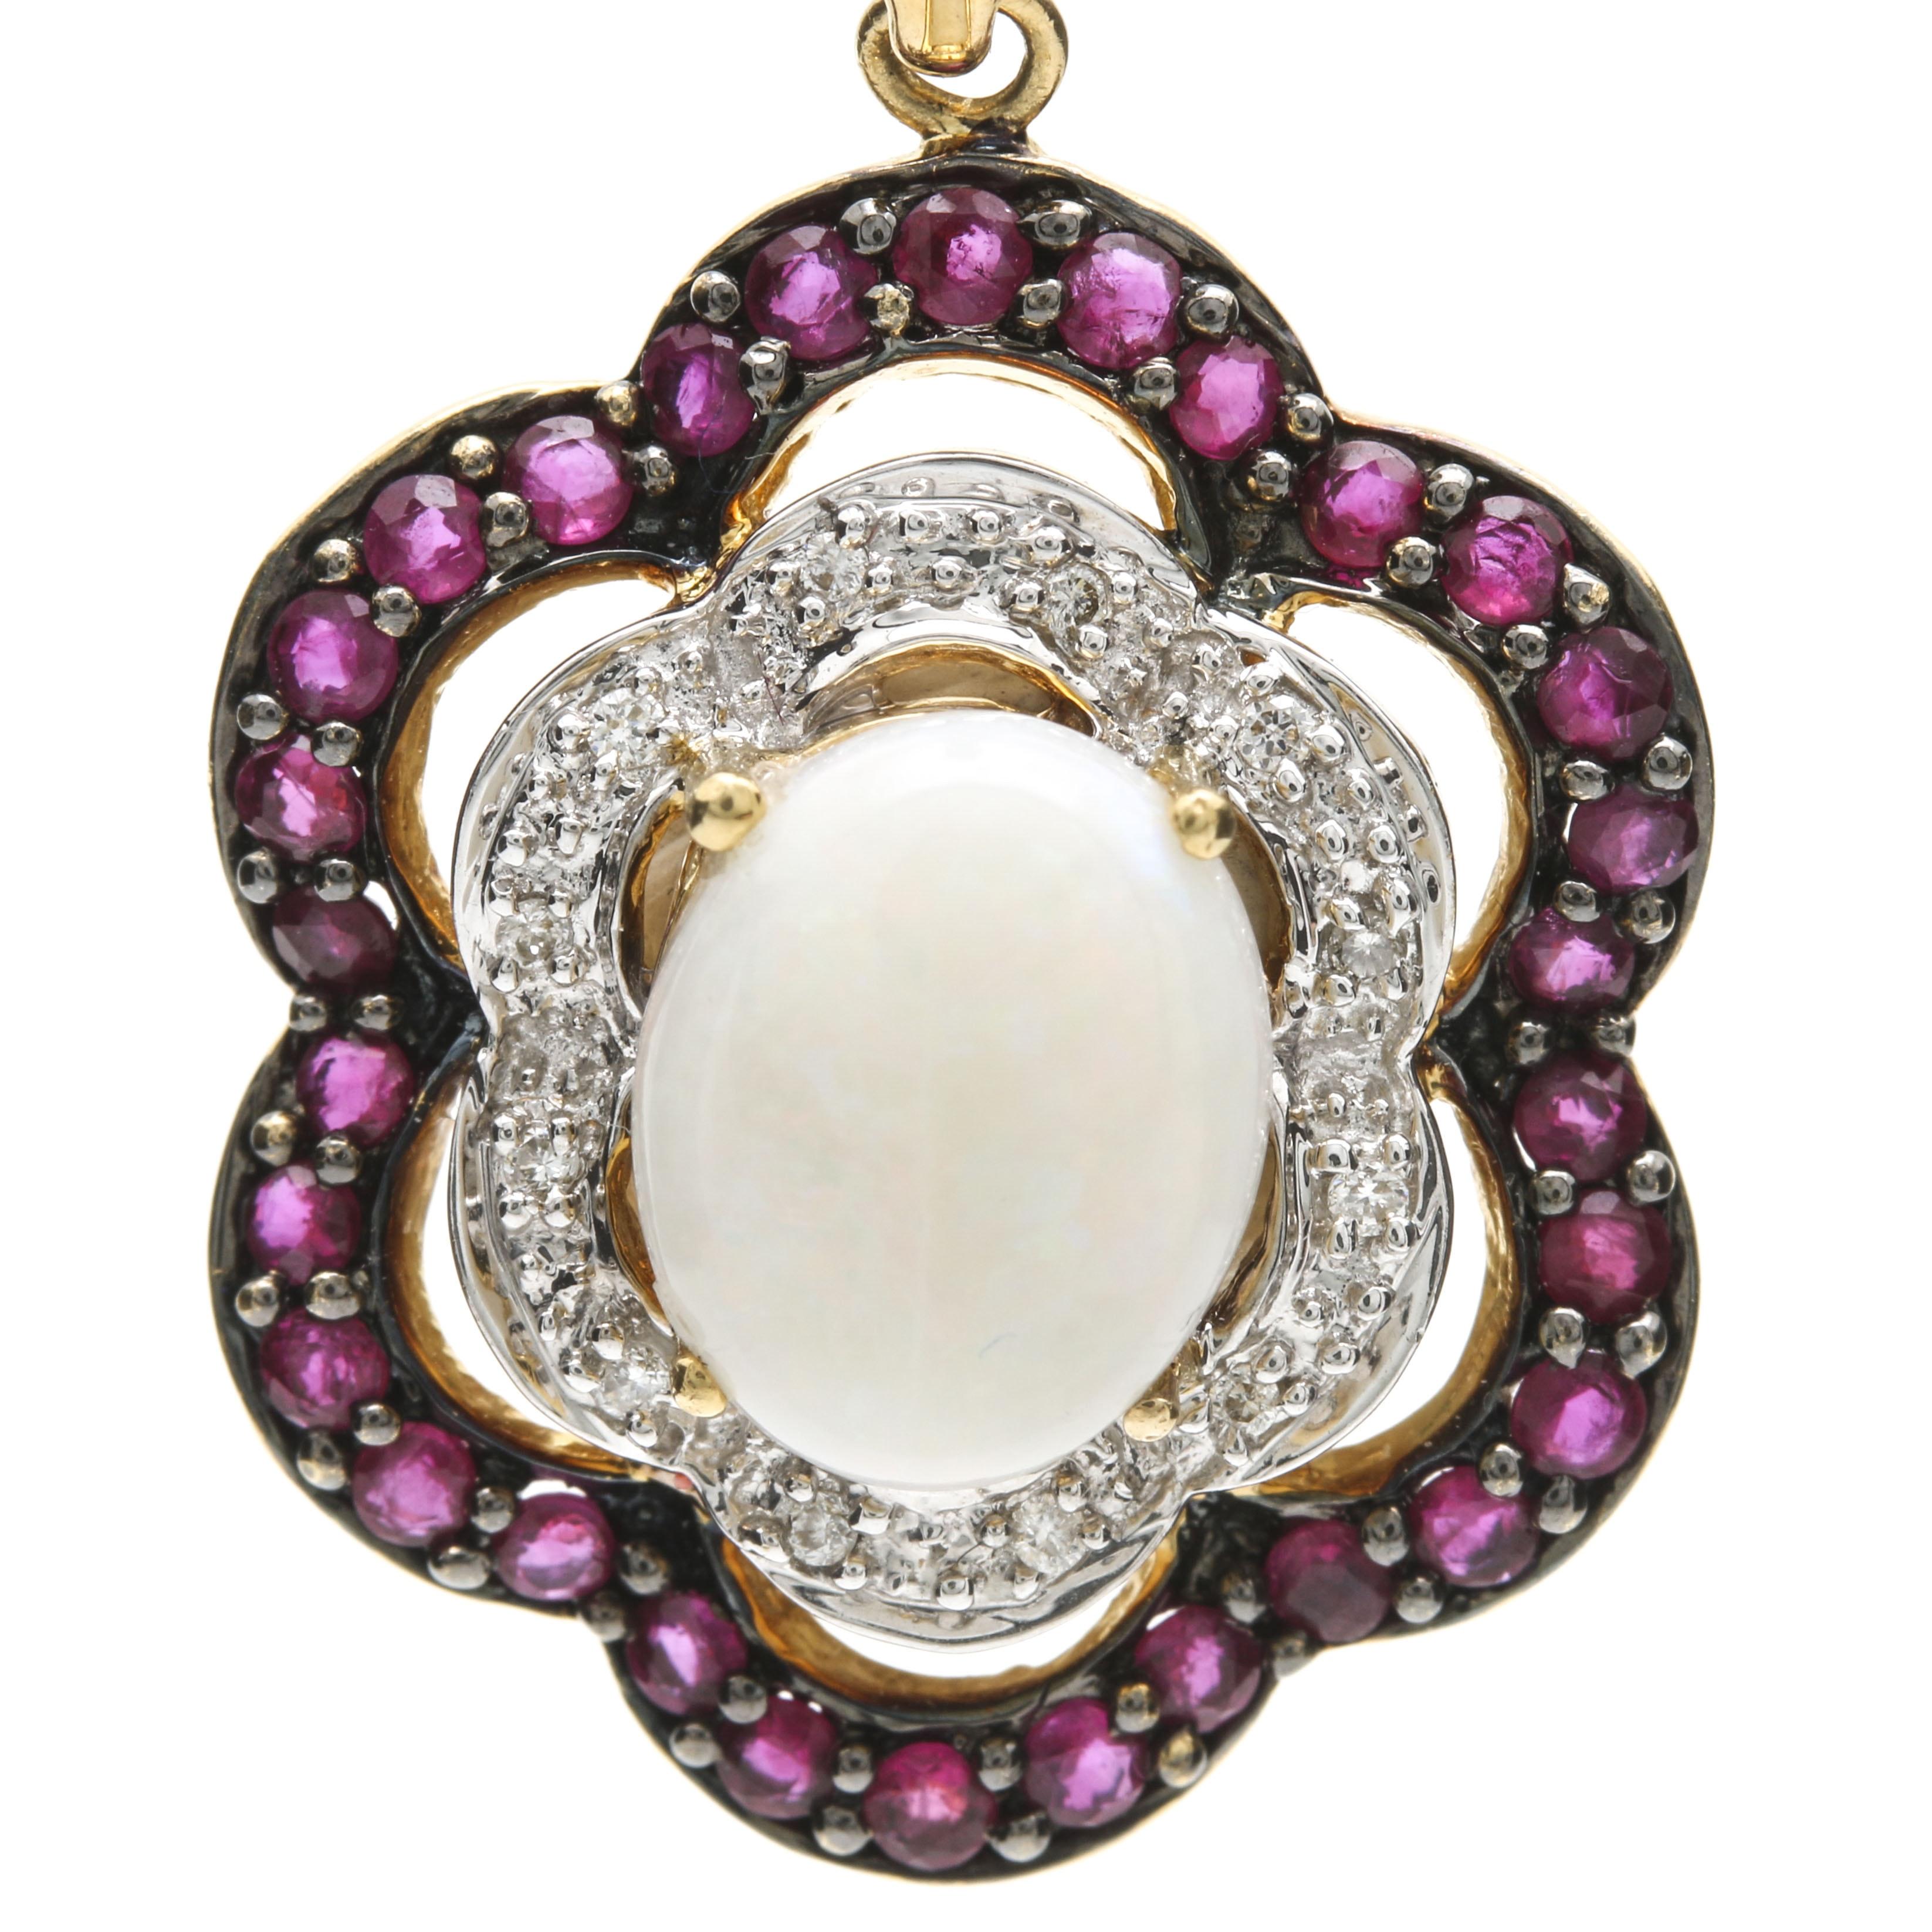 18K Yellow Gold Opal, Ruby, and Diamond Pendant